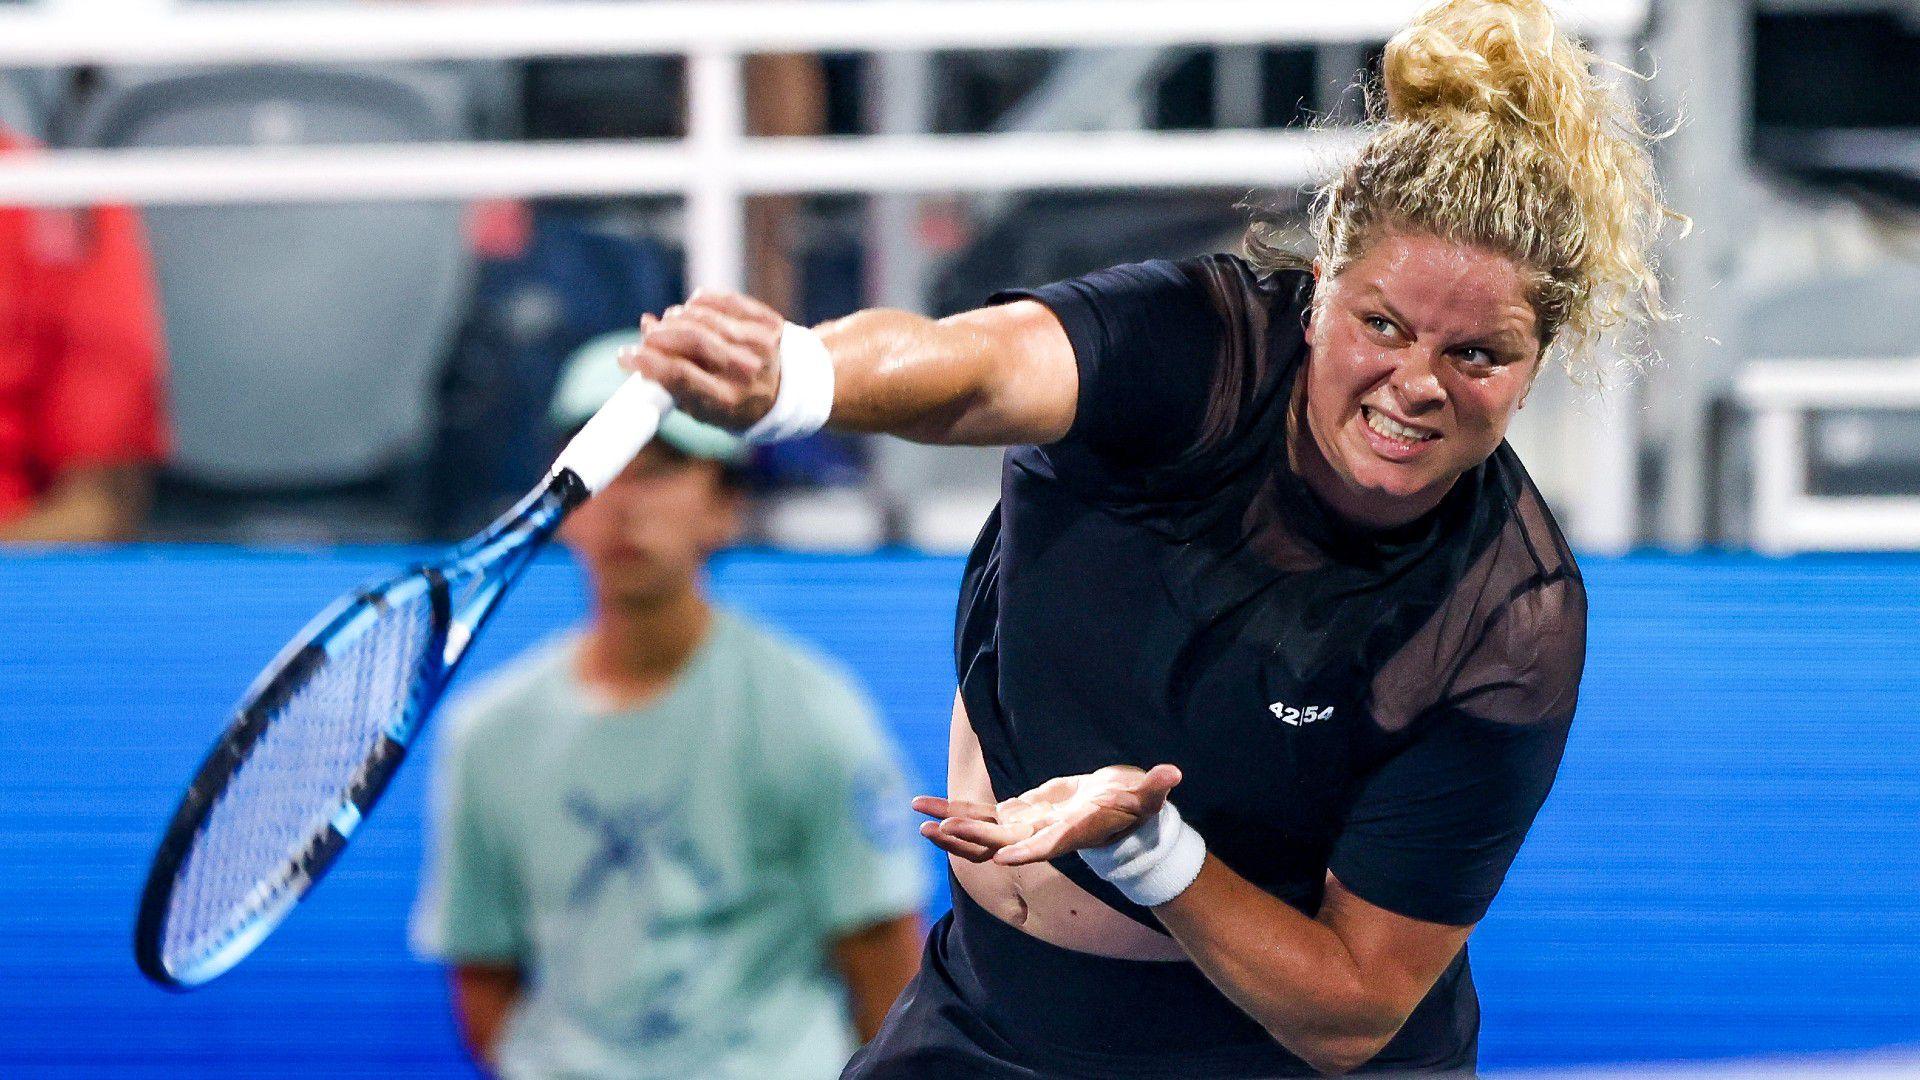 Former Australian Open winner Kim Clijsters on verge of comeback bid